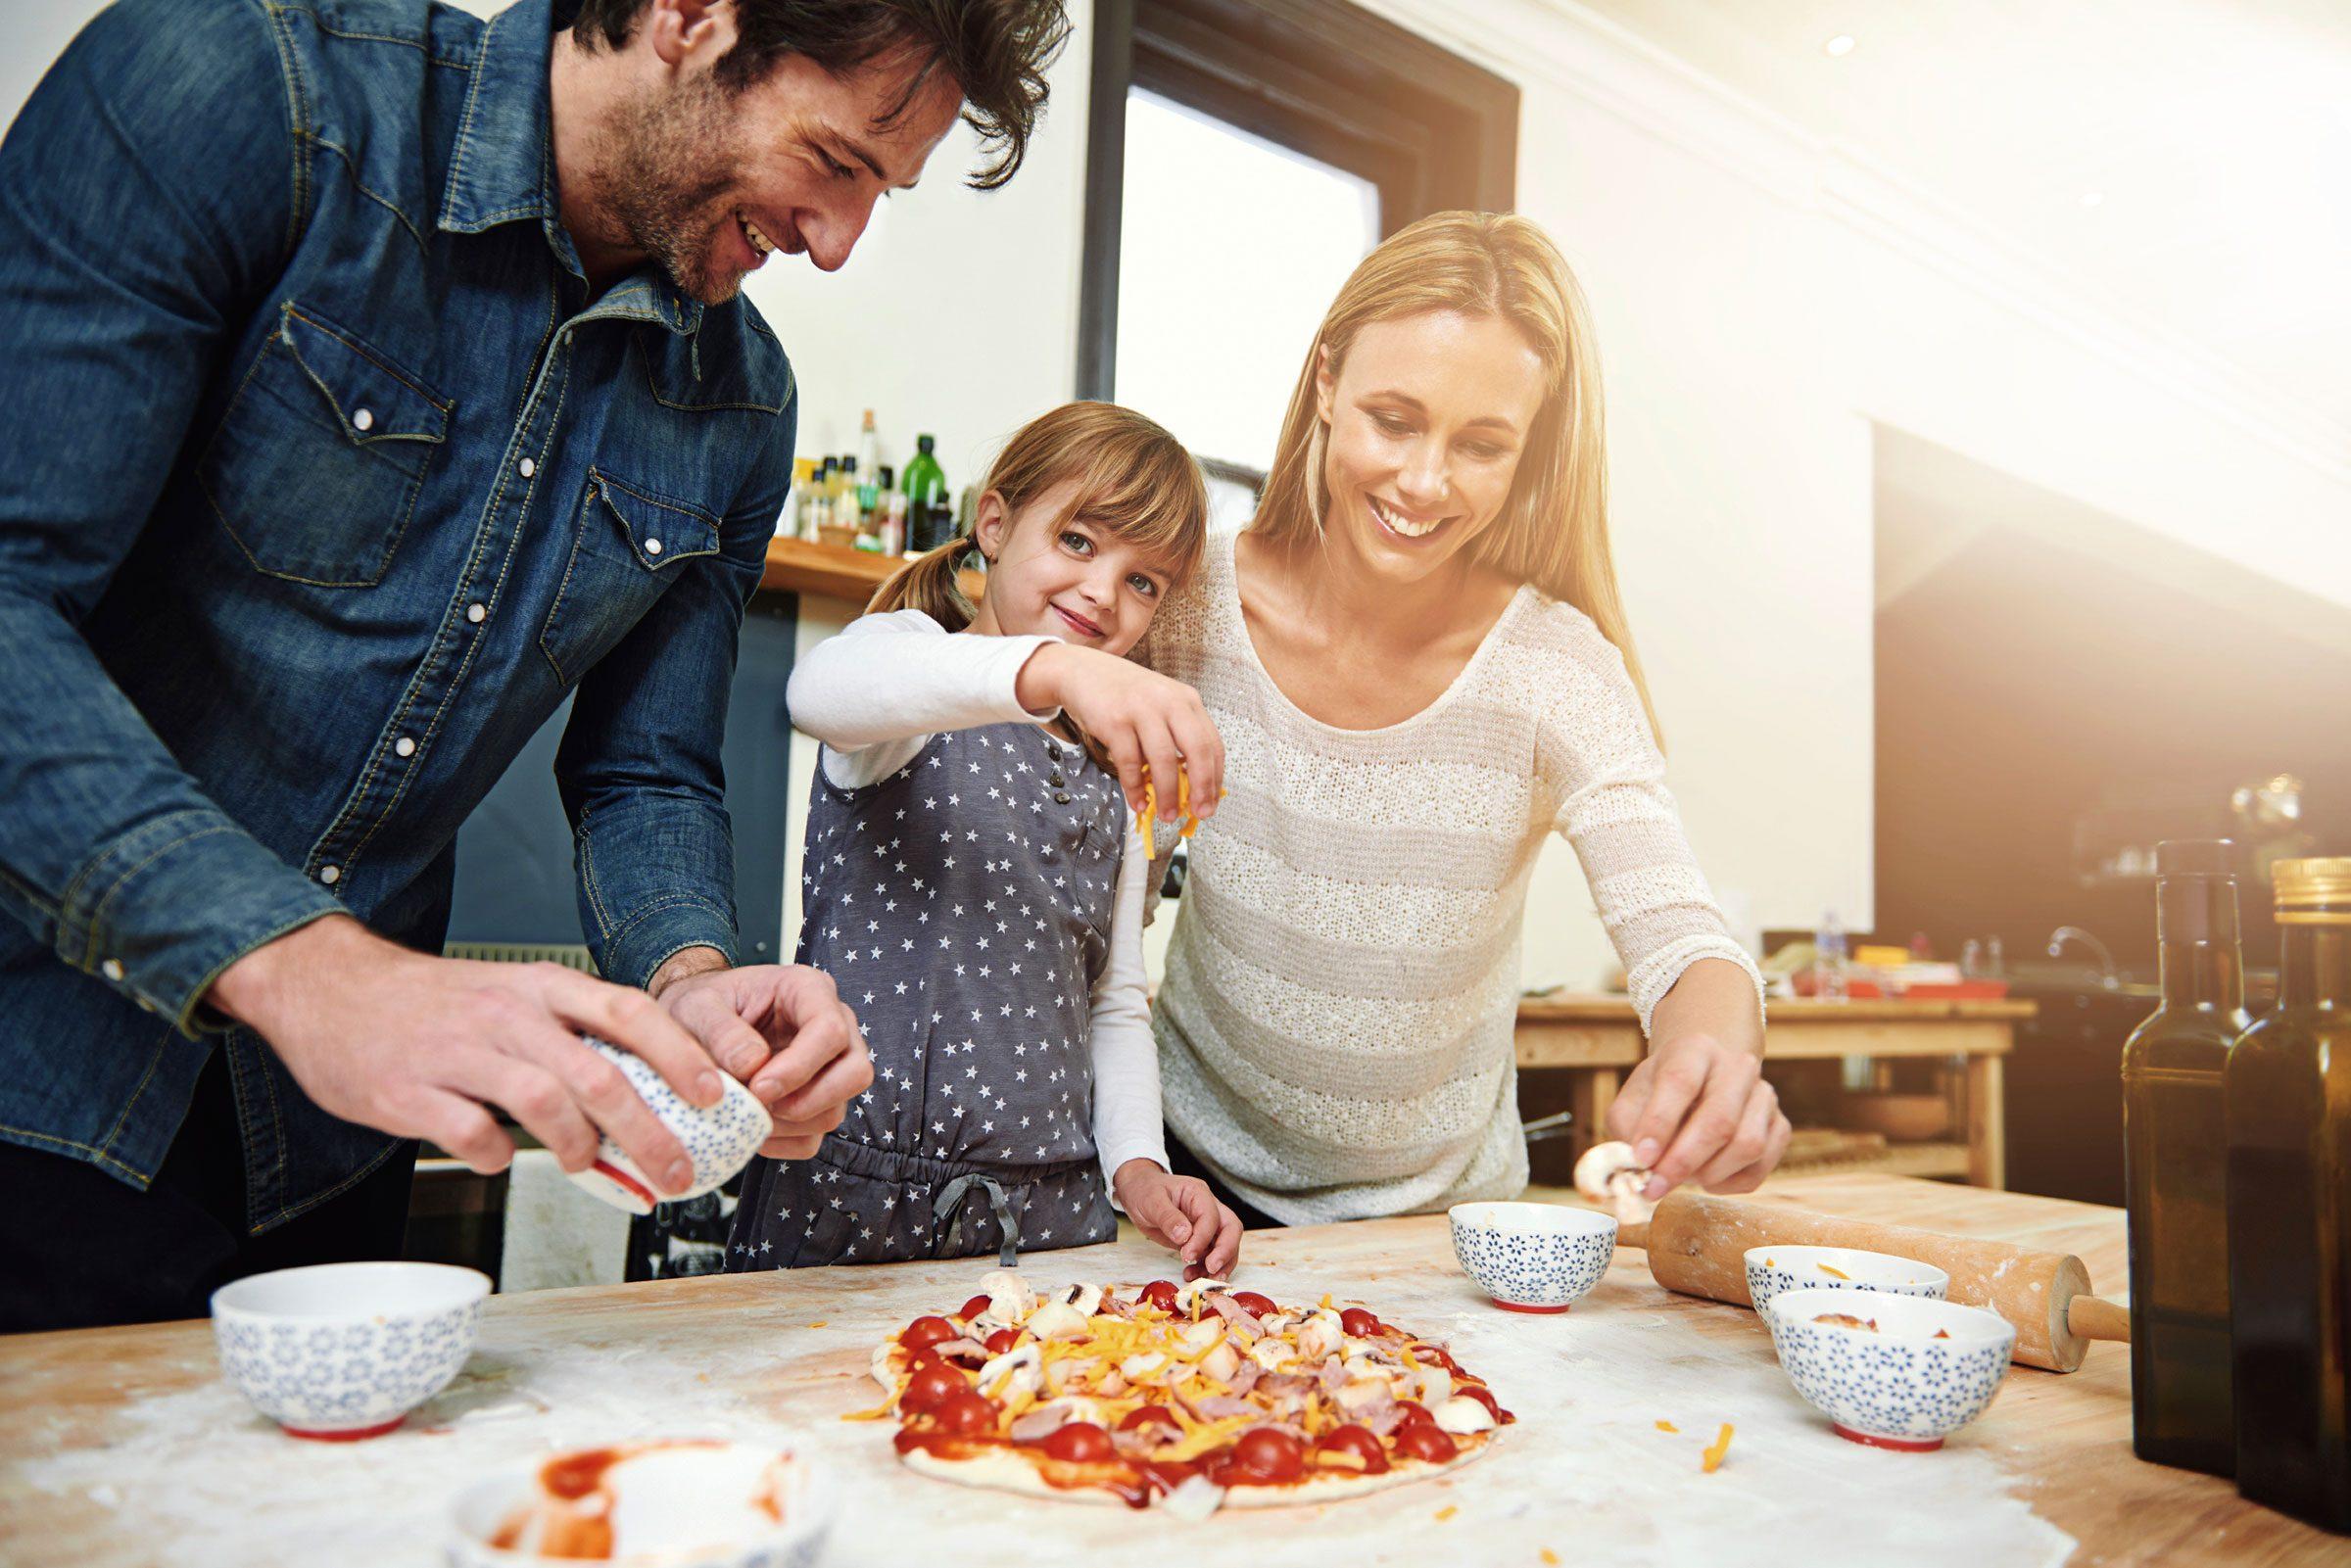 Eating Habits That Prevent Diabetes Readers Digest